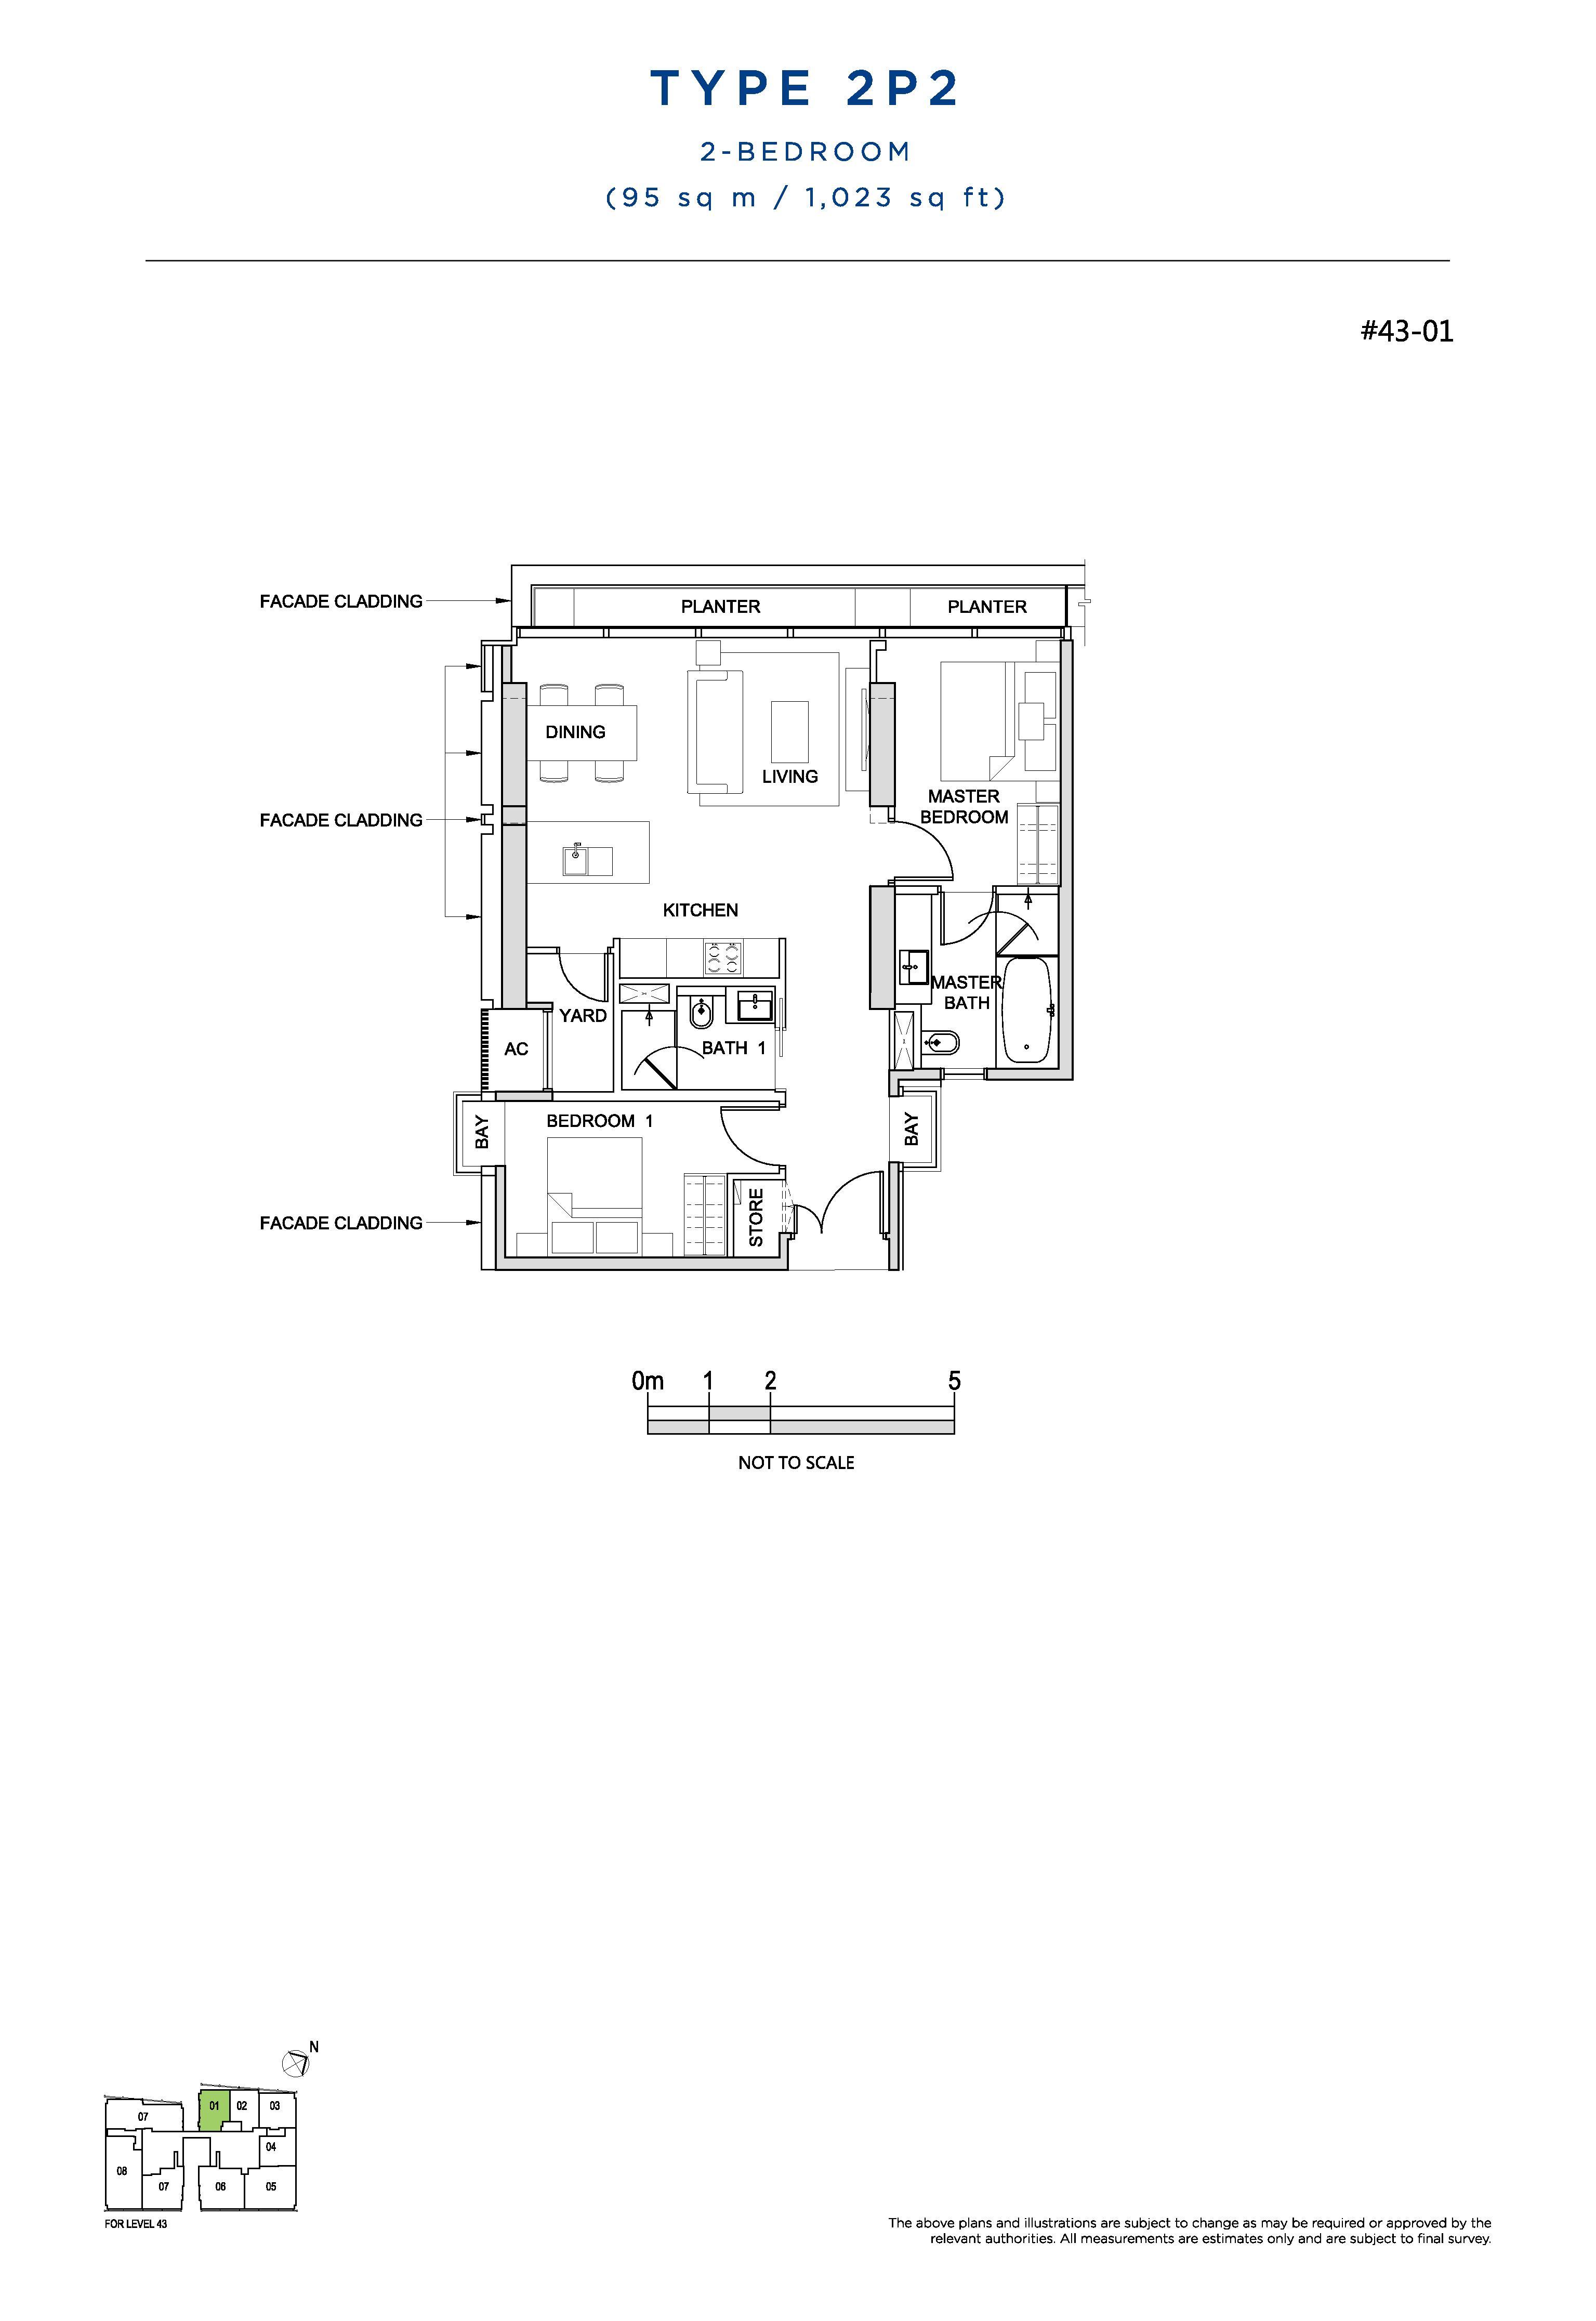 South Beach Residences 2 Bedroom Floor Plans Type 2P2